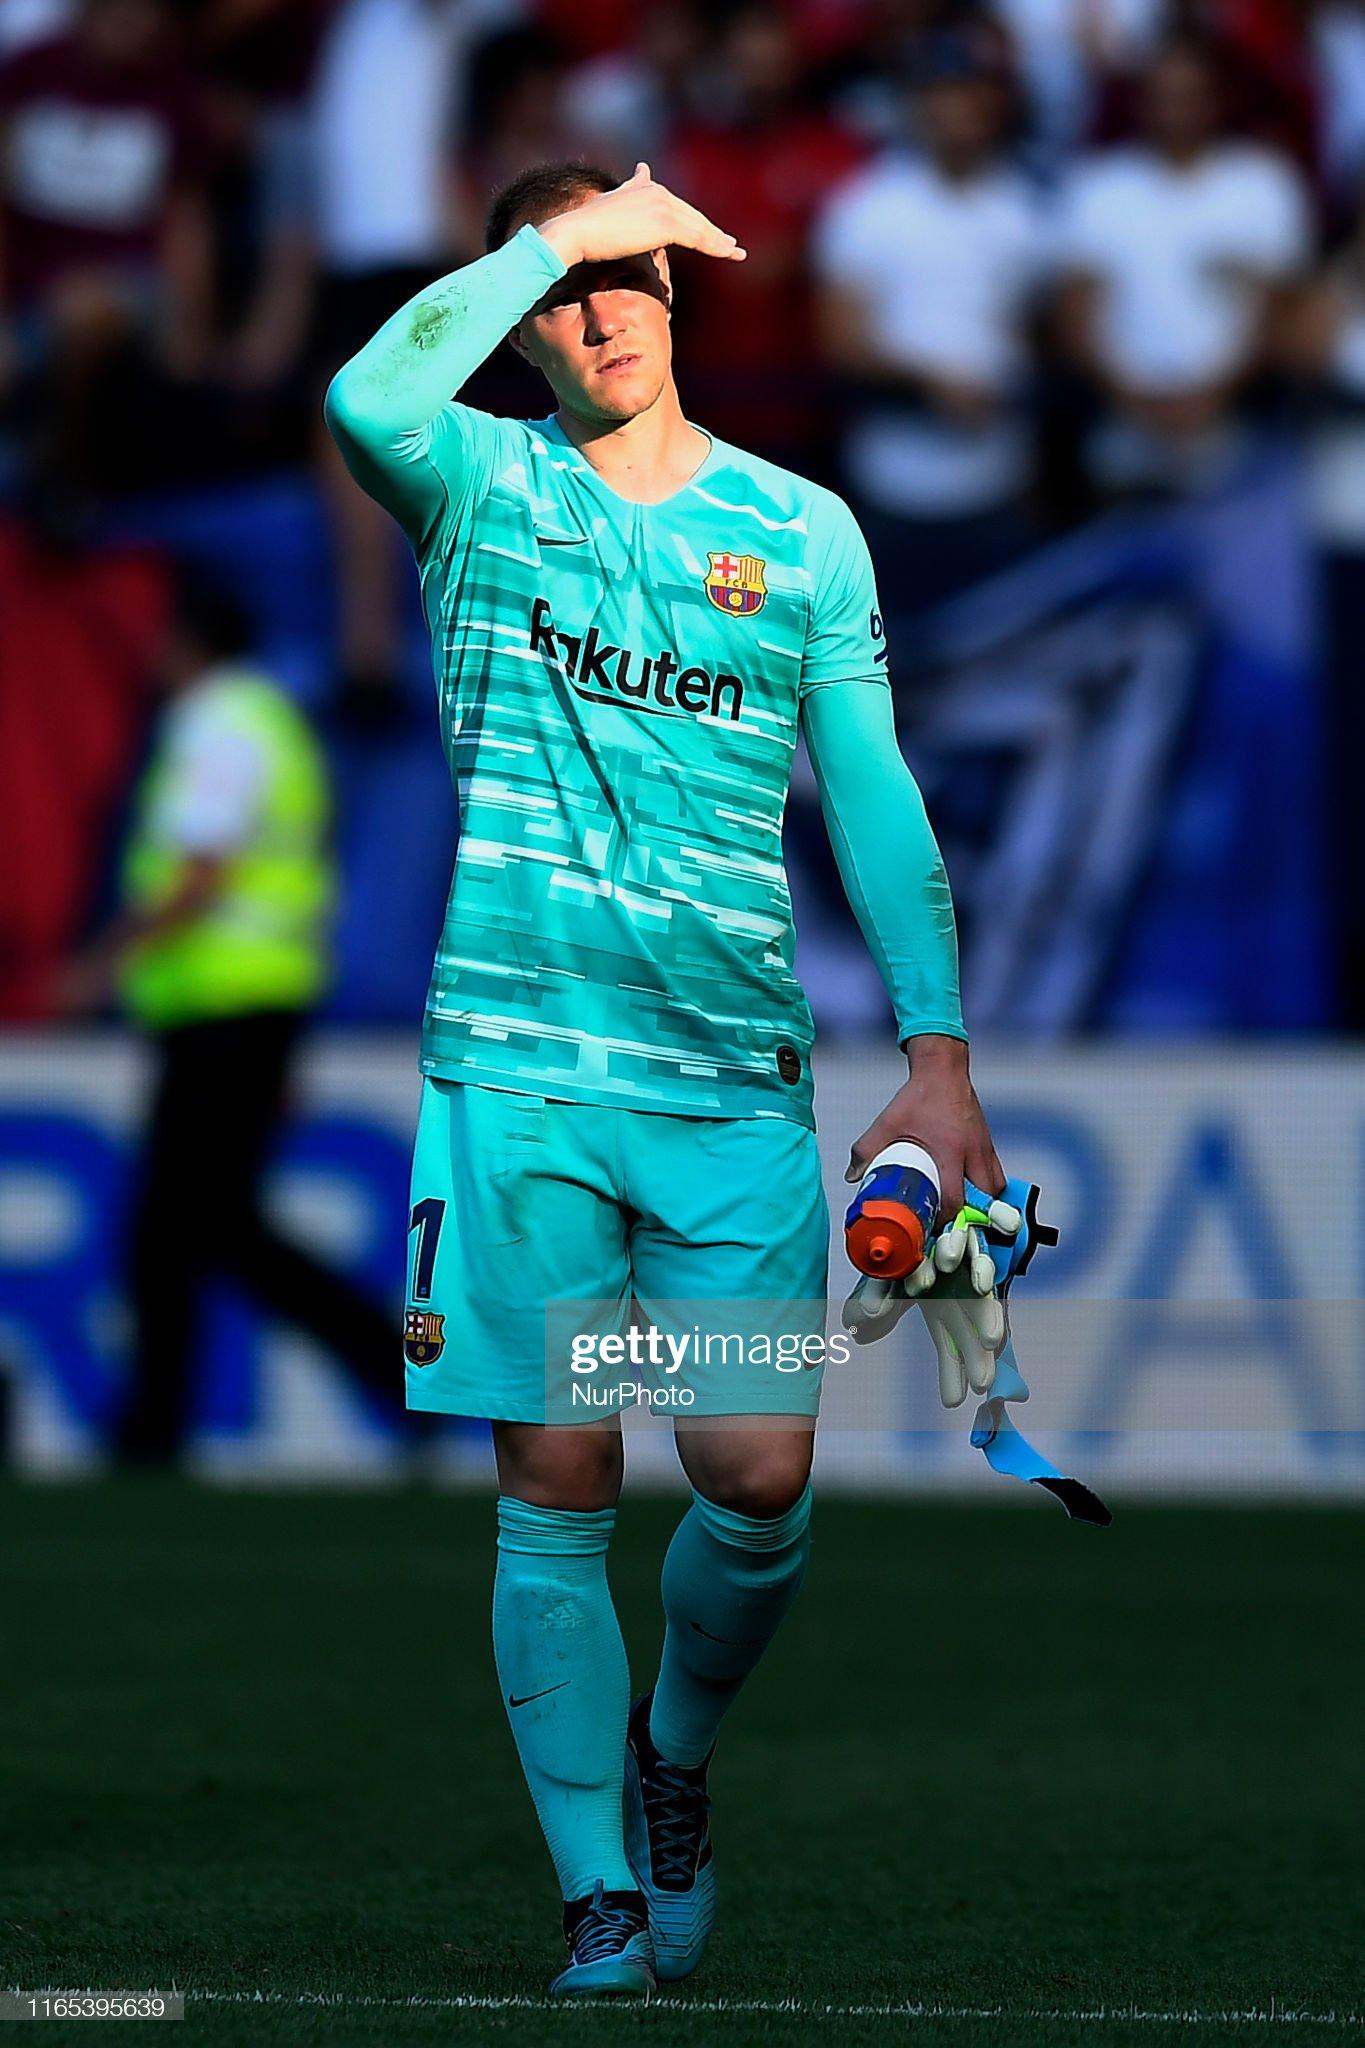 صور مباراة : أوساسونا - برشلونة 2-2 ( 31-08-2019 )  Andre-ter-stegen-of-barcelona-looks-on-during-the-liga-match-between-picture-id1165395639?s=2048x2048